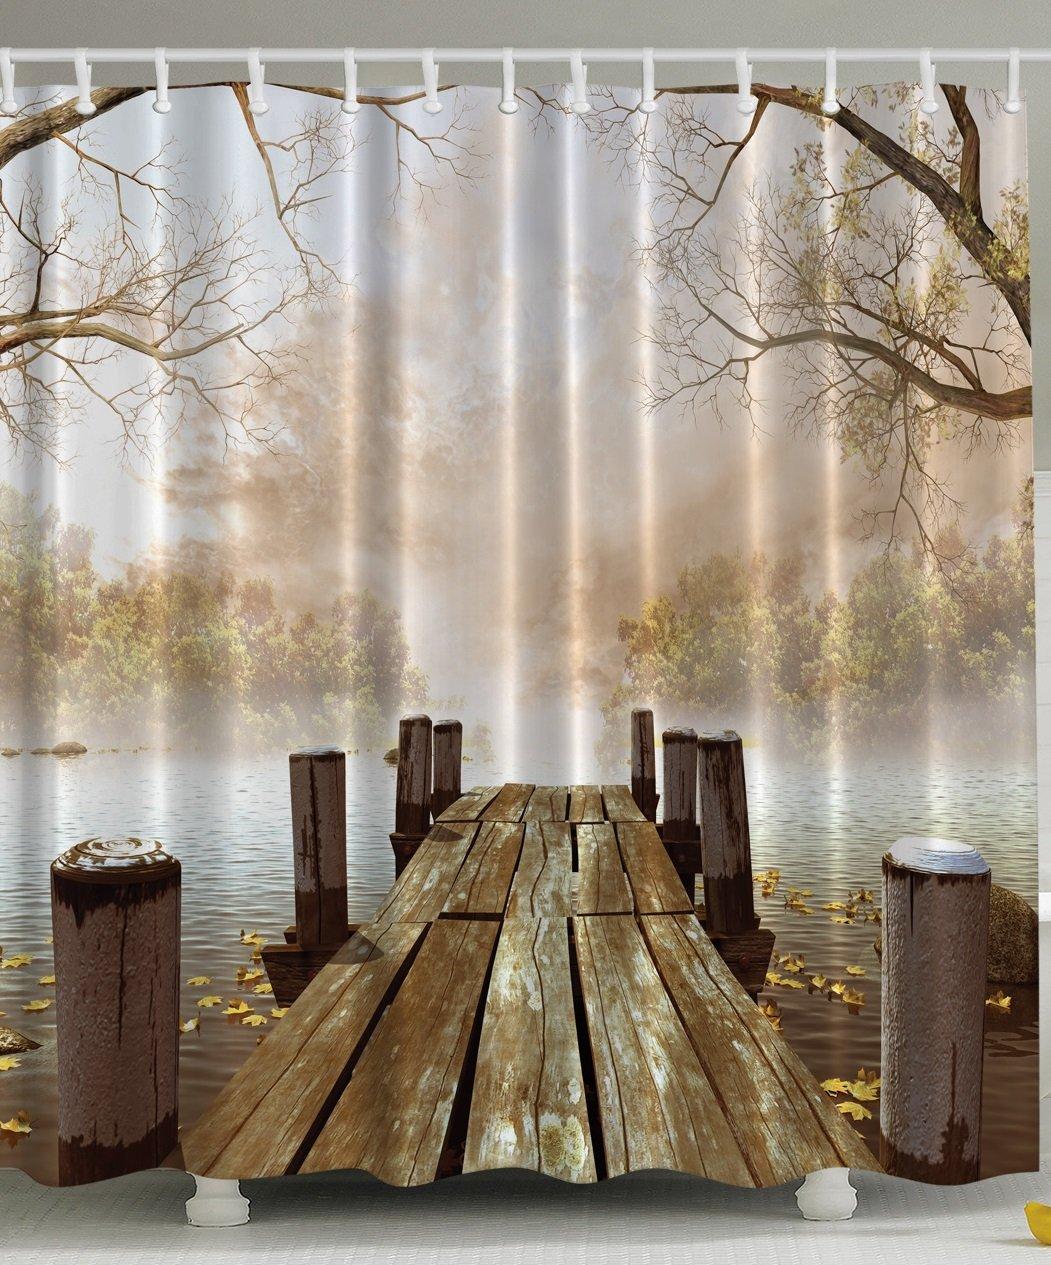 Shower Curtain Bathroom Decor Fall Wooden Bridge Seasons Lake House ...